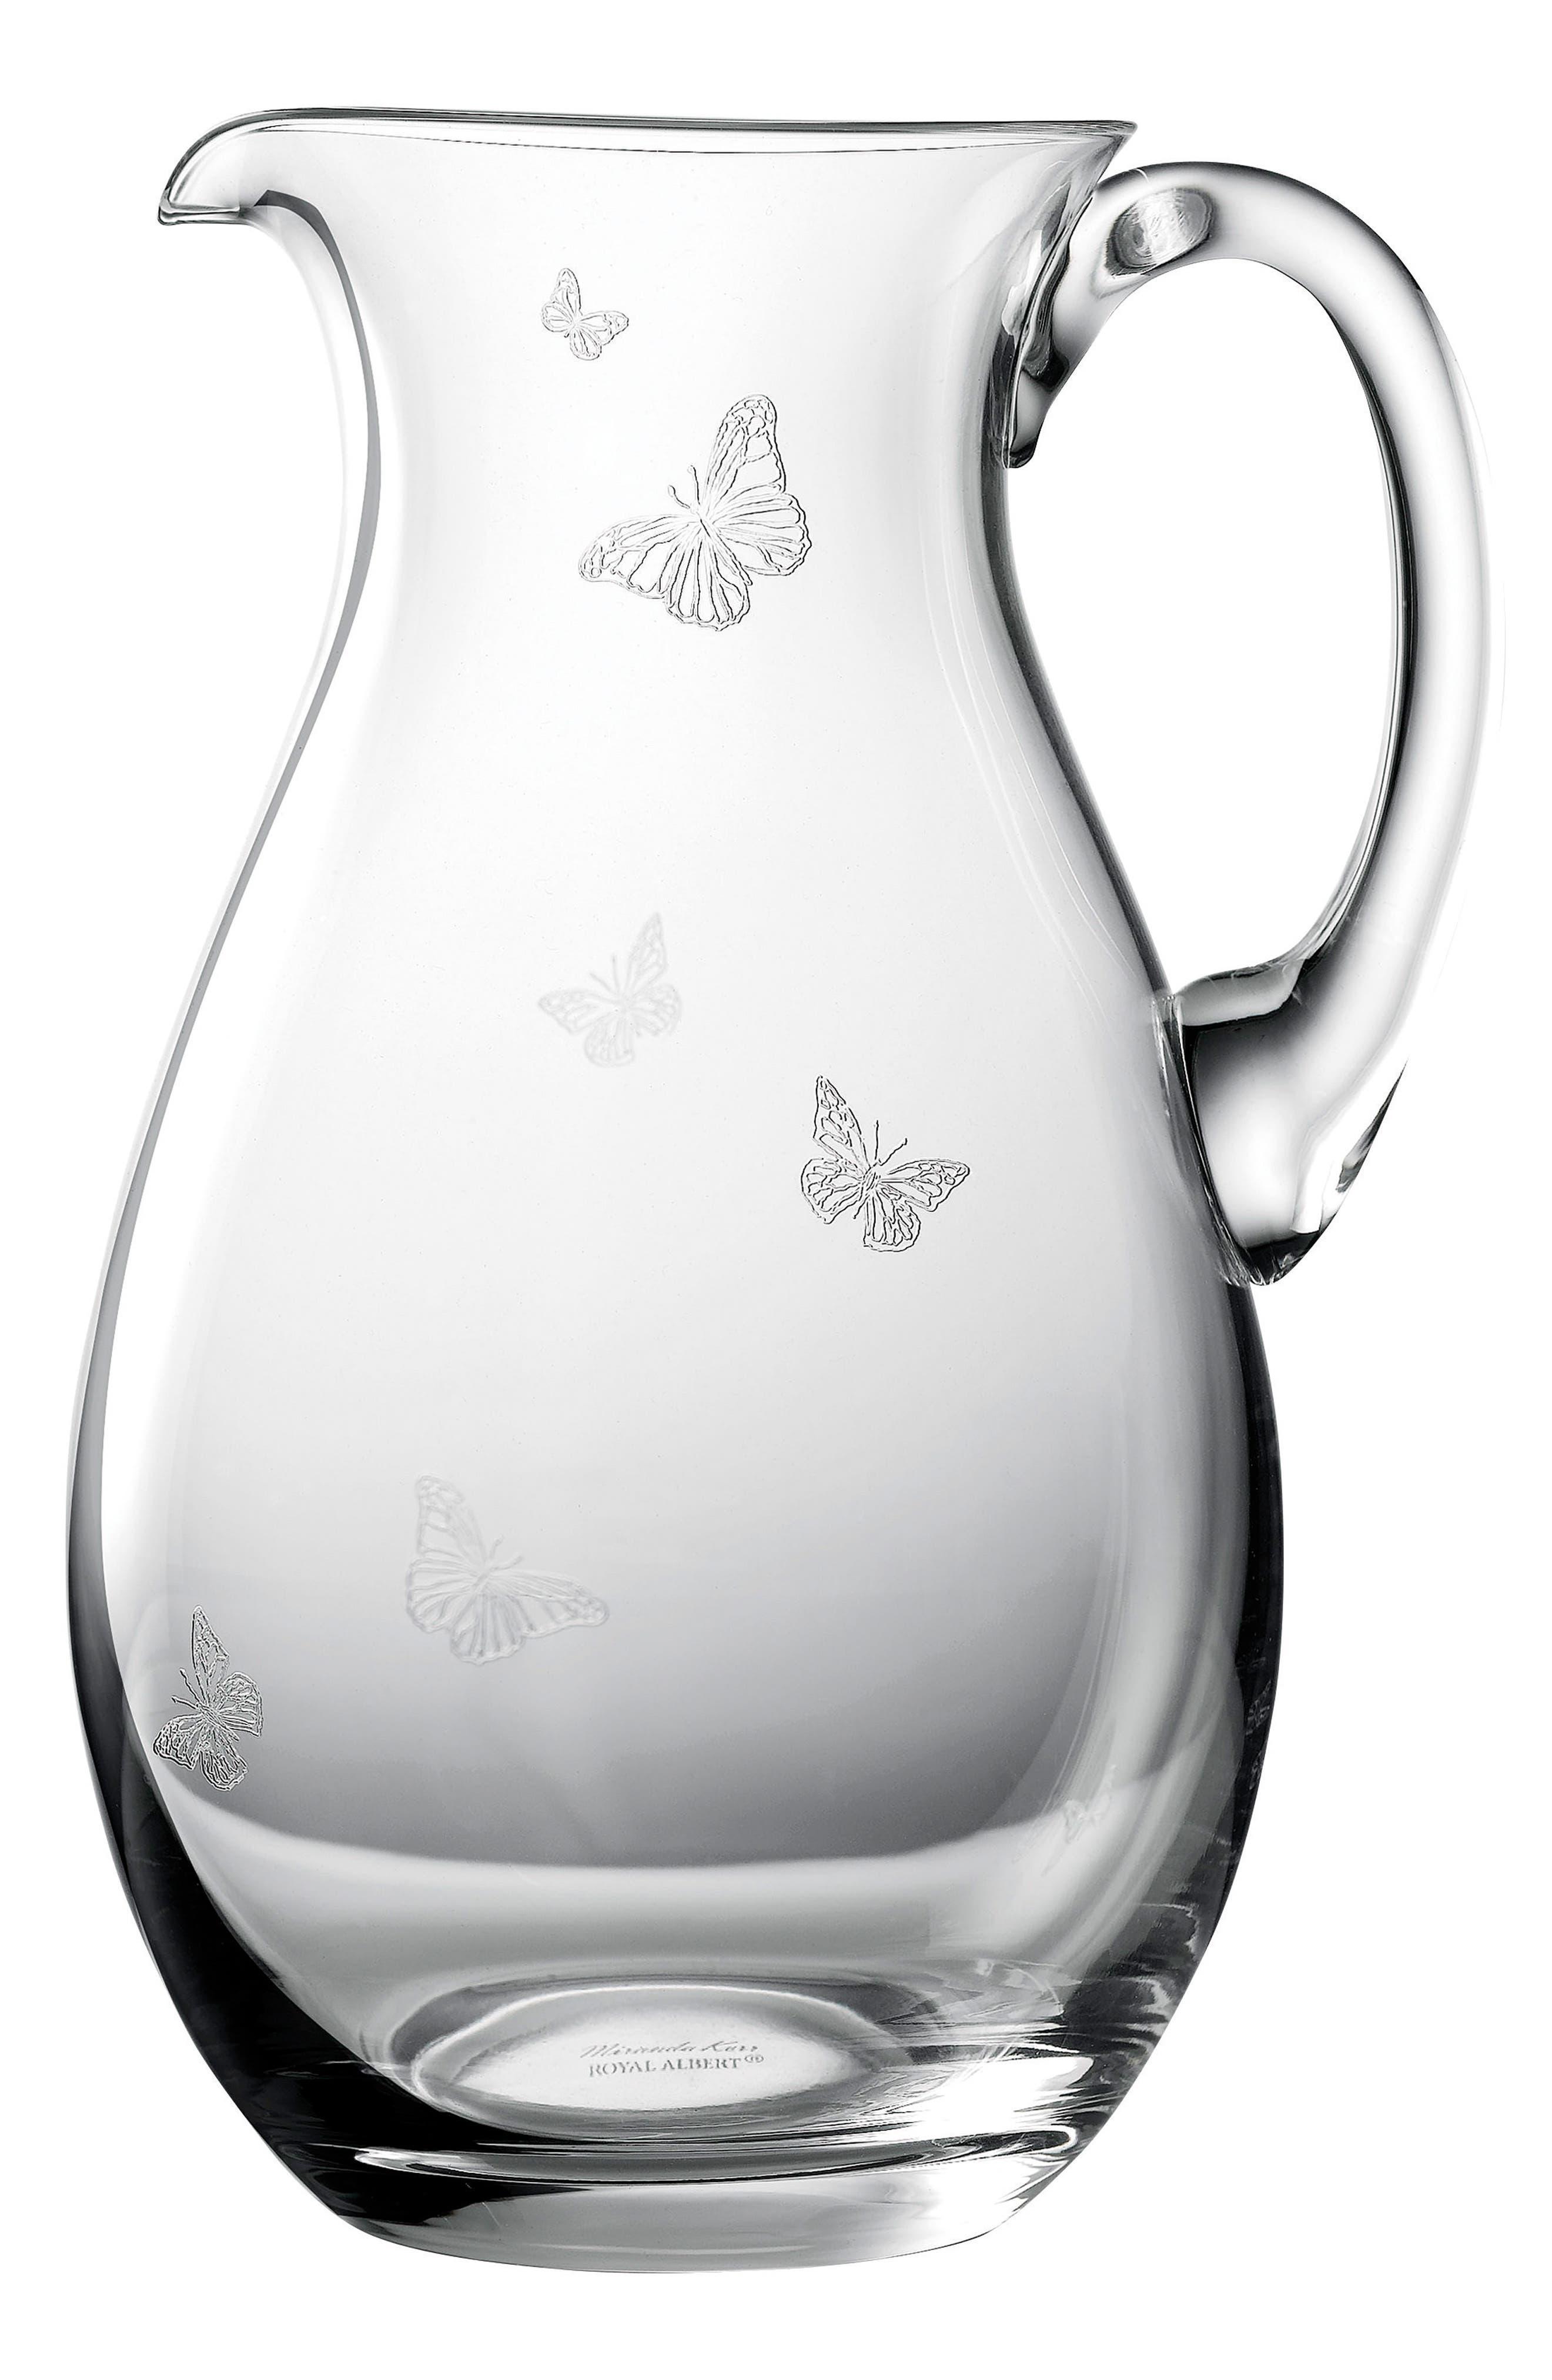 Miranda Kerr for Royal Albert Friendship Glass Pitcher